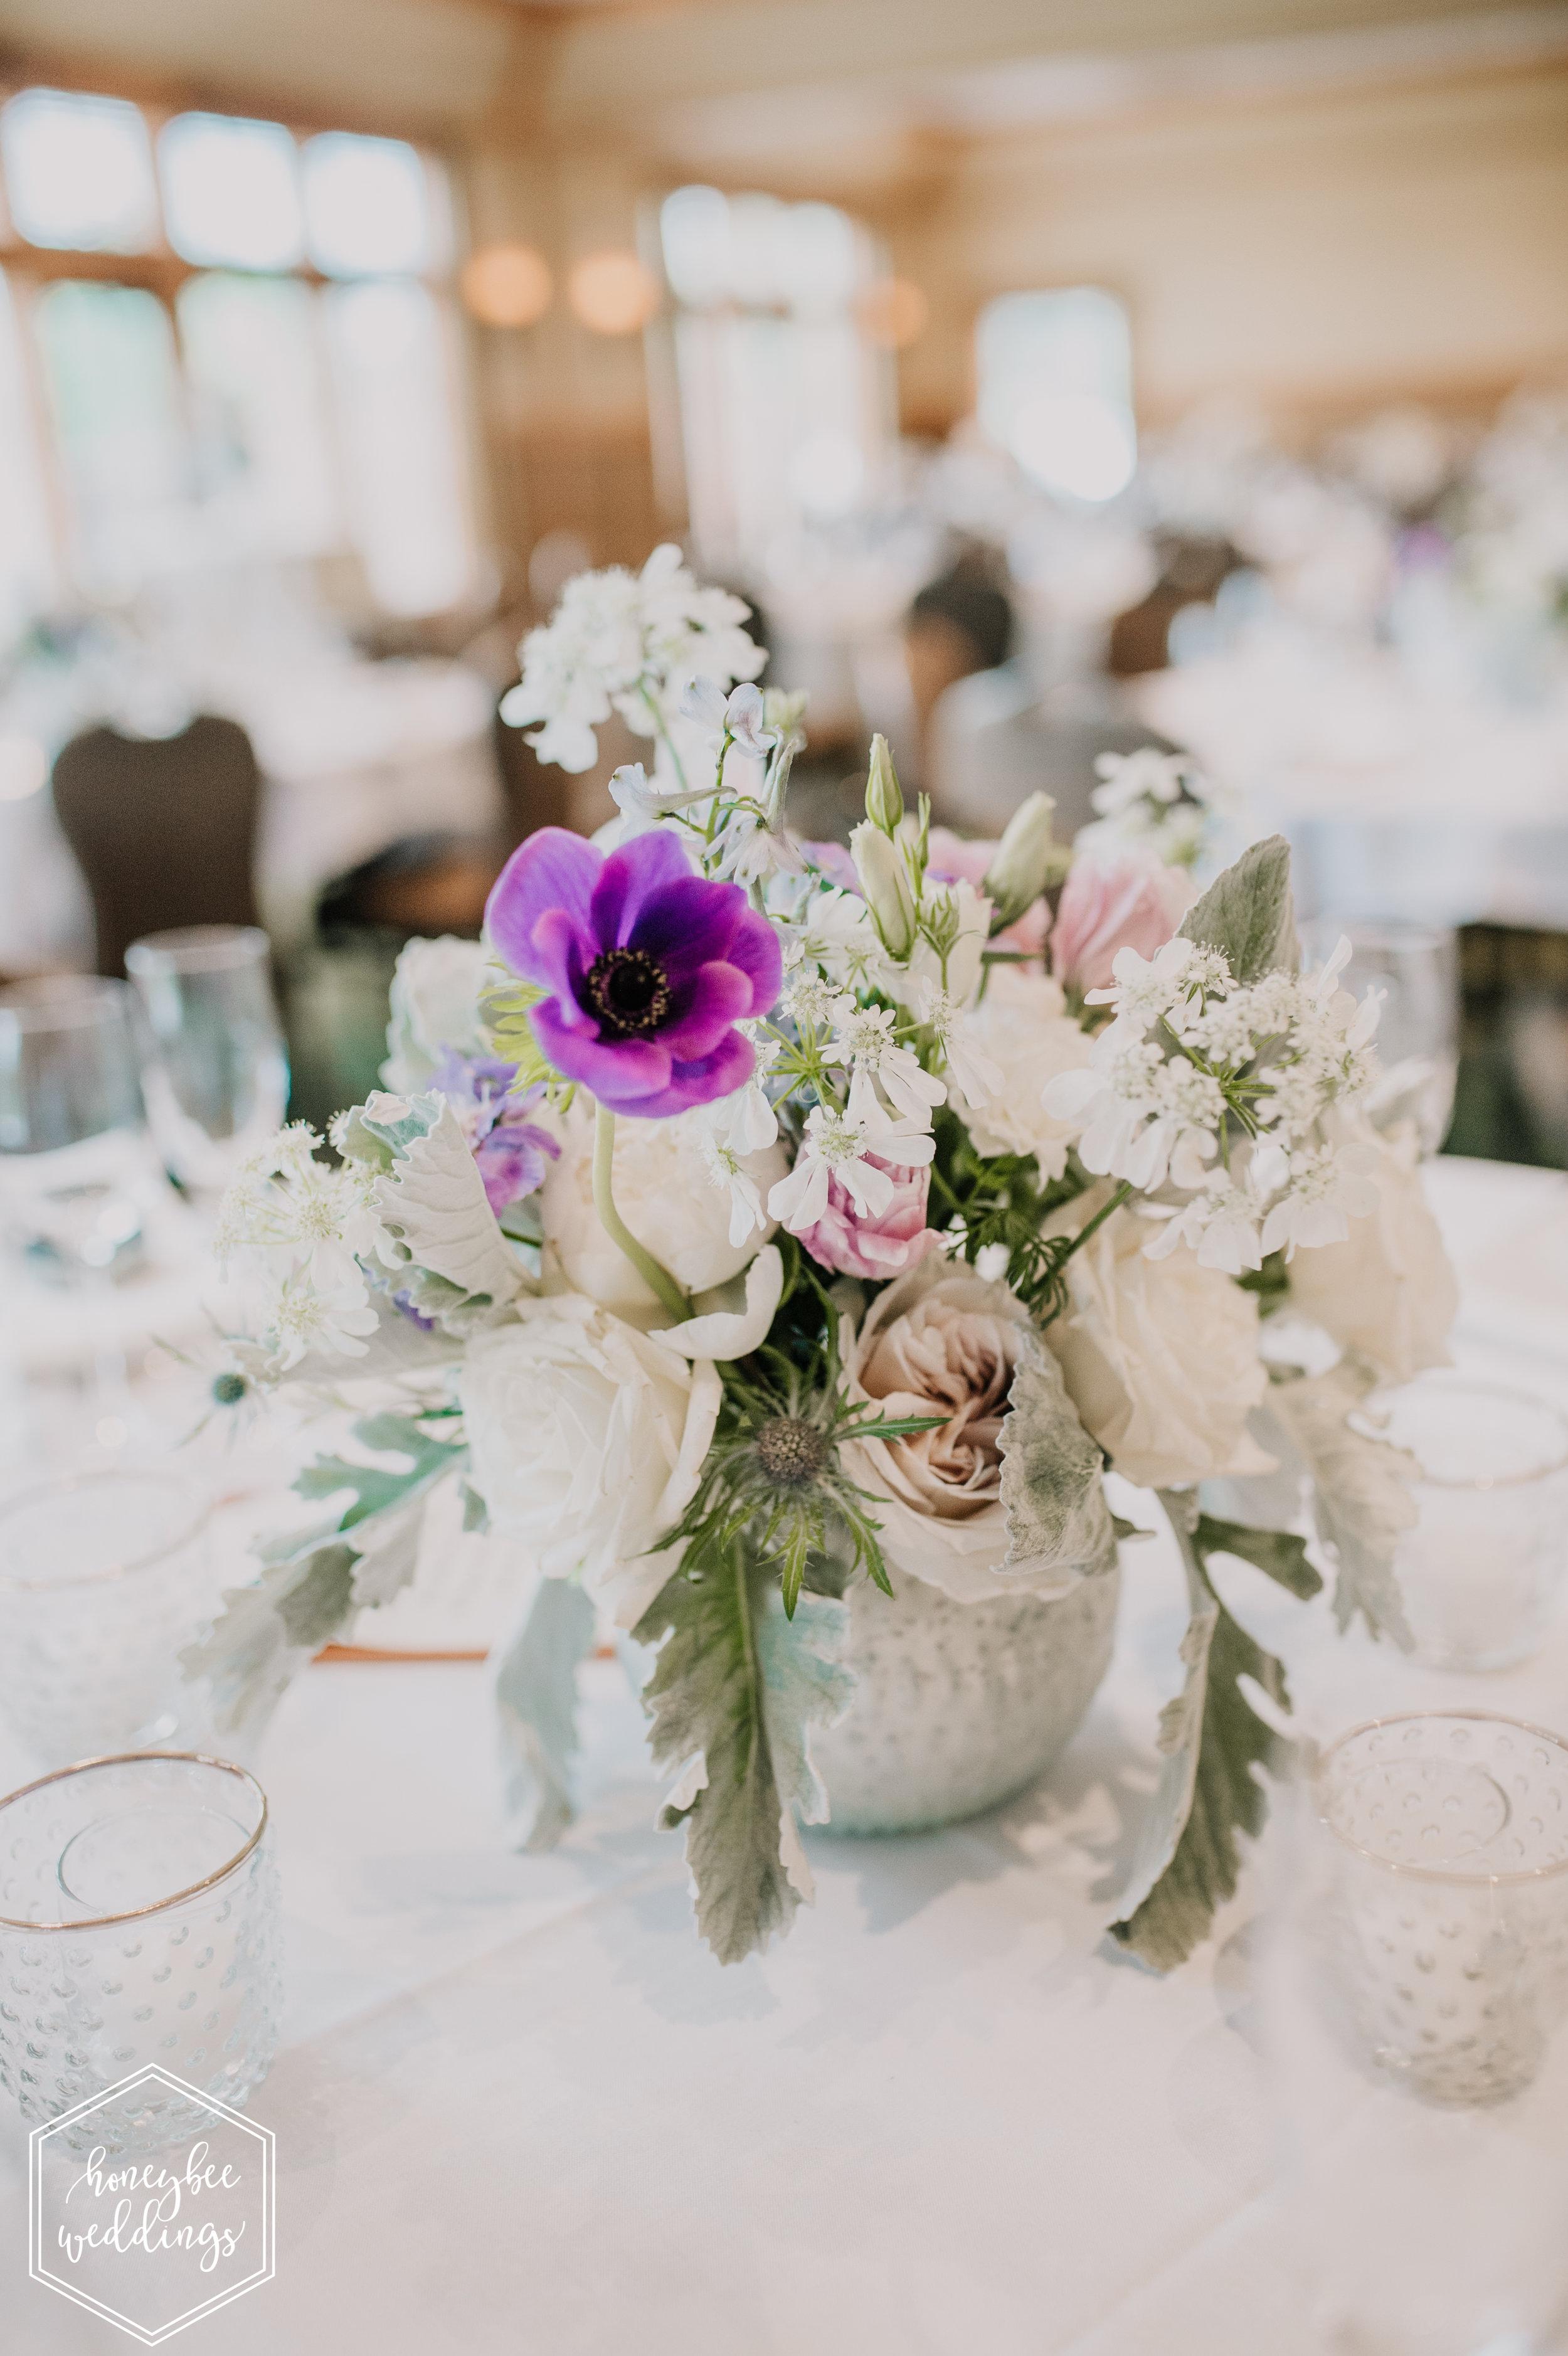 426 Riverside Country Club Wedding_Montana Wedding Photographer_Lauren Jackson + Evan Ivaldi 2018-7990.jpg